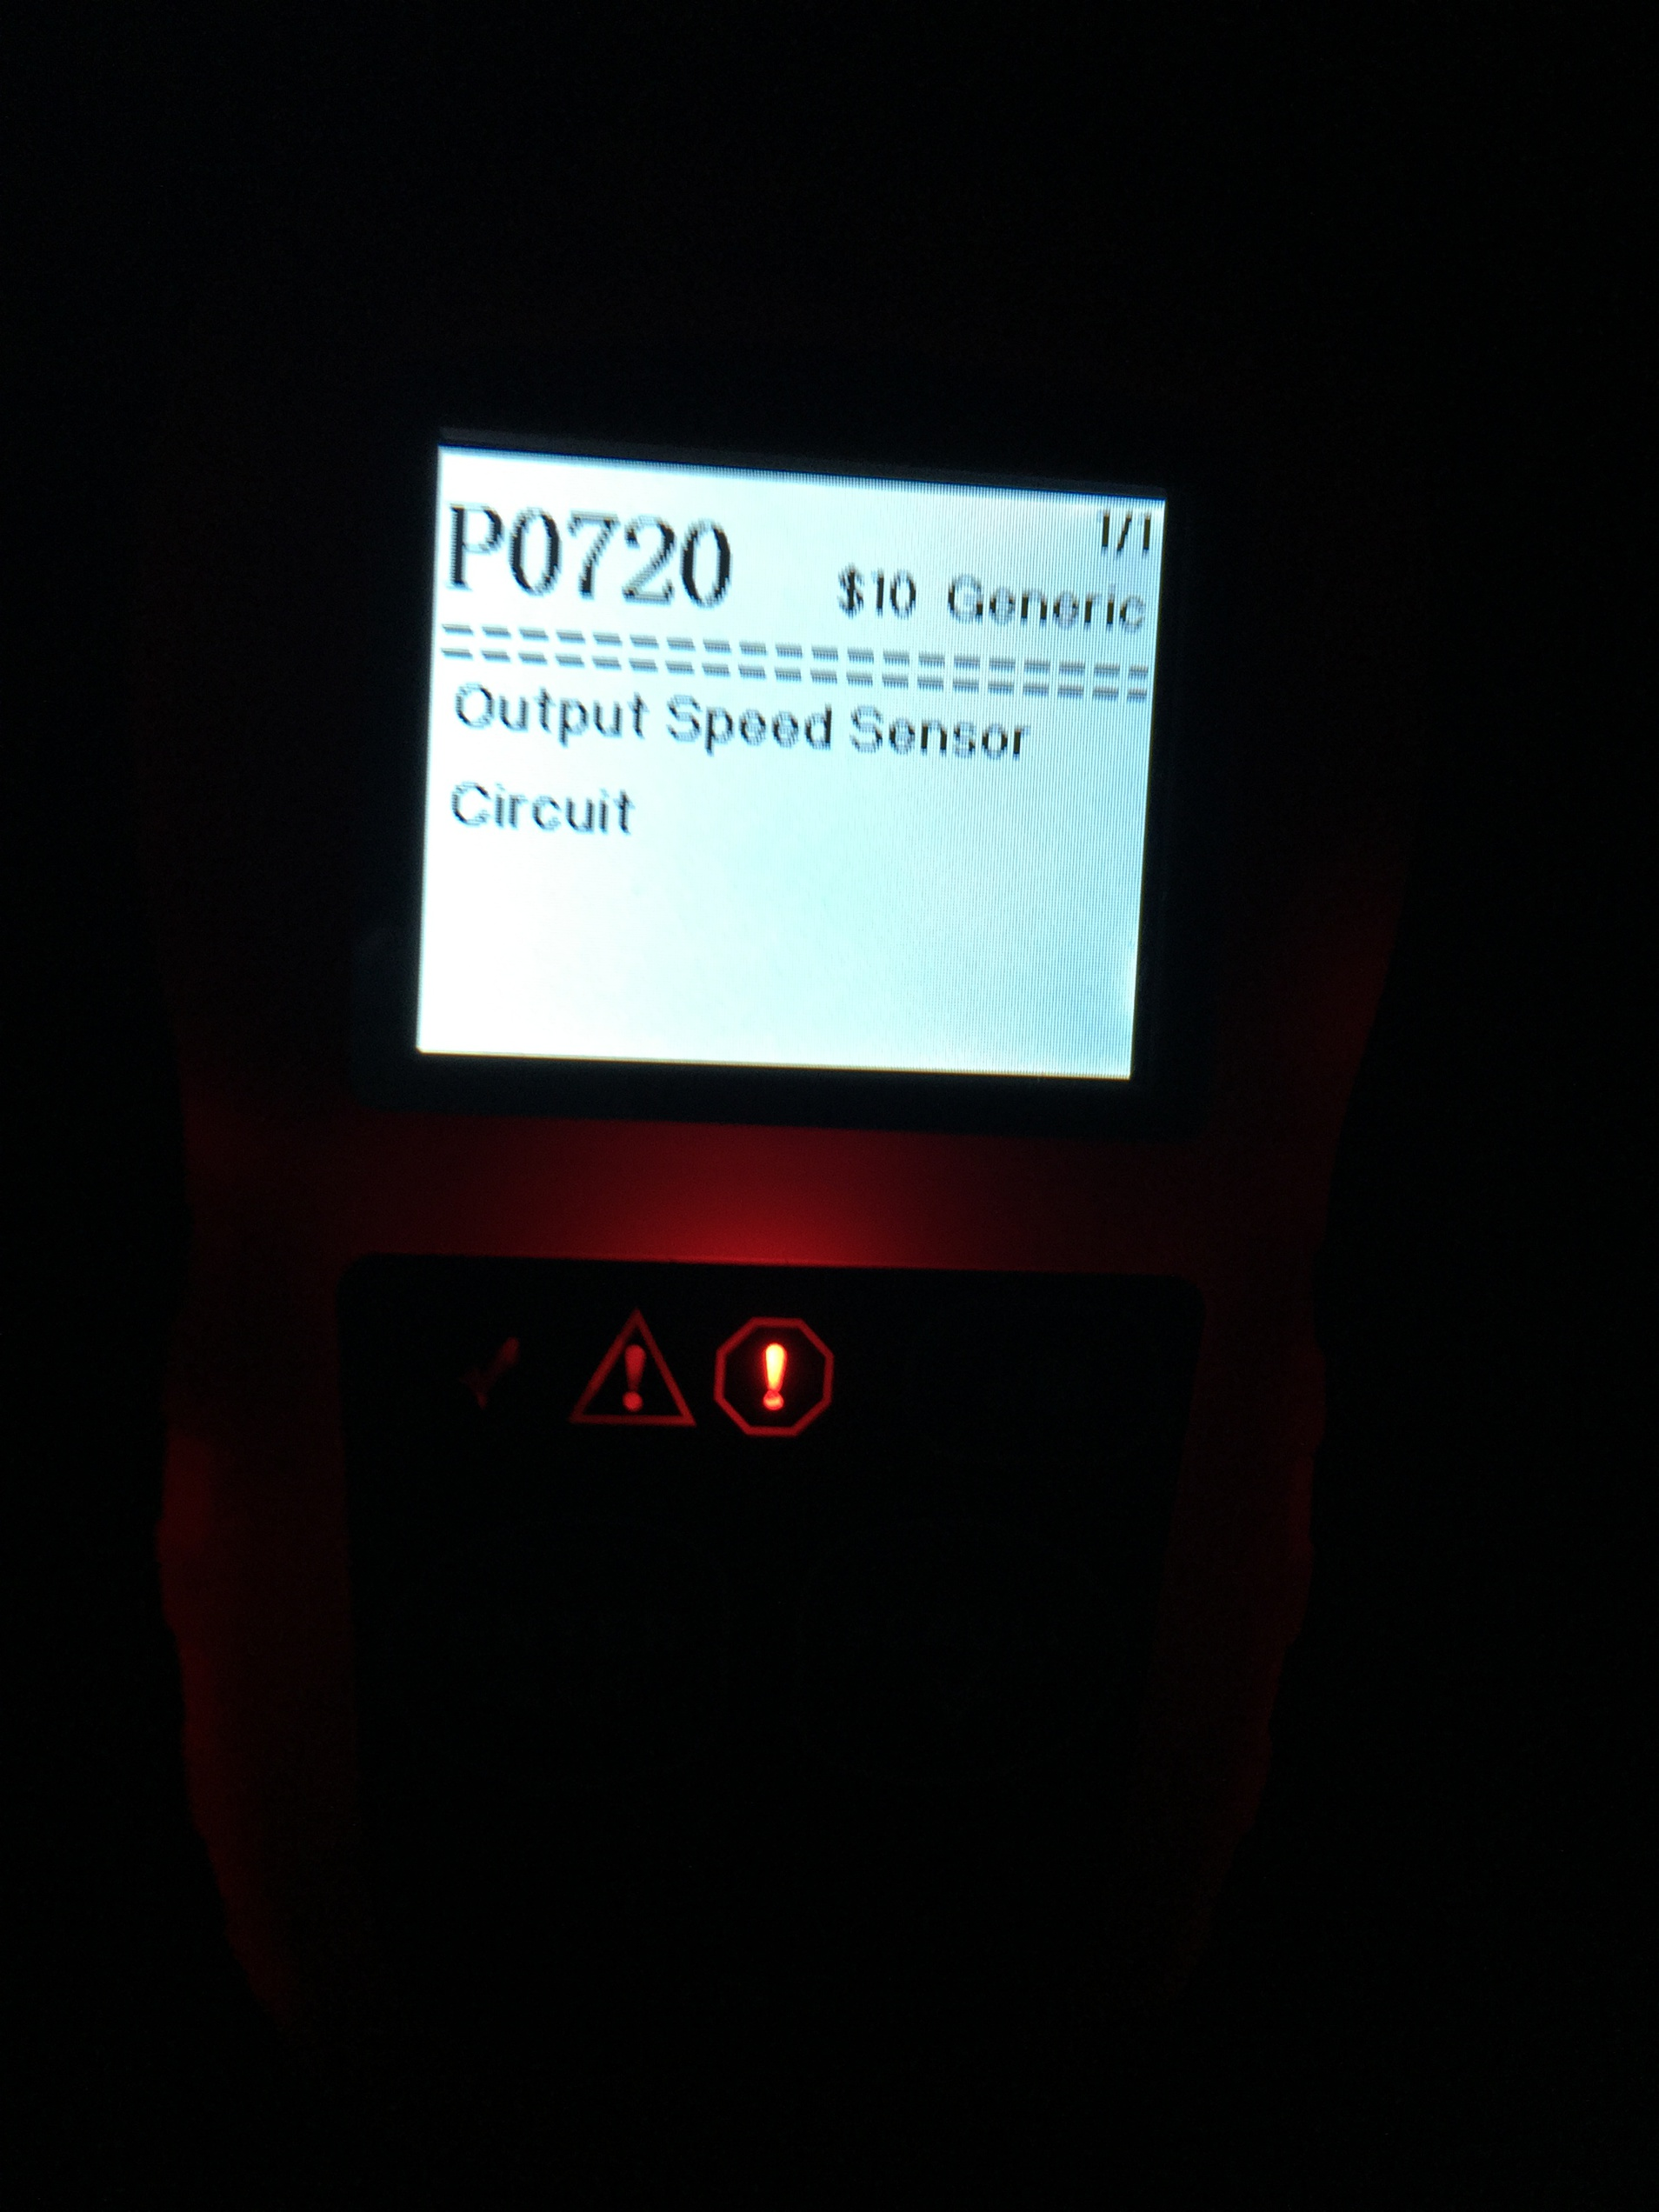 Cruise Control not work caused speedo to fail? P0720 Code Speed